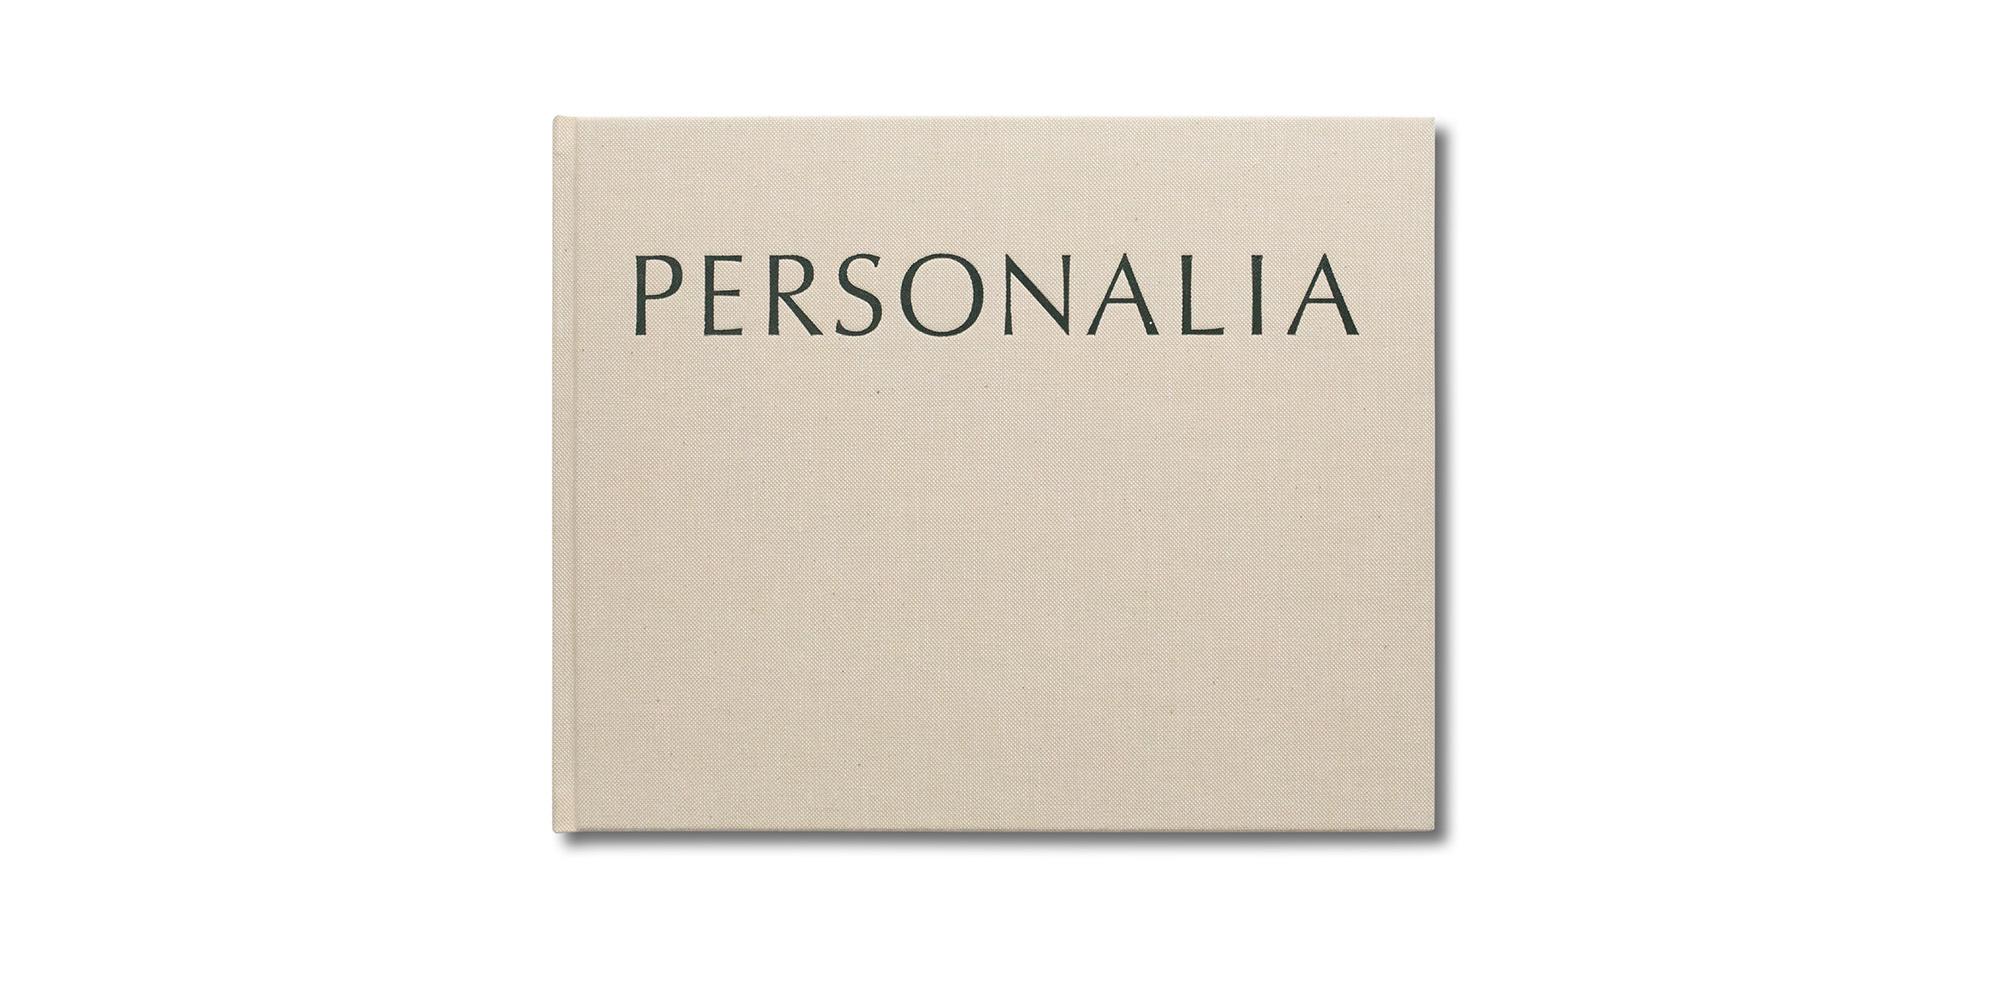 Personalia_JanneRiikonen_kultbooks_001.jpg